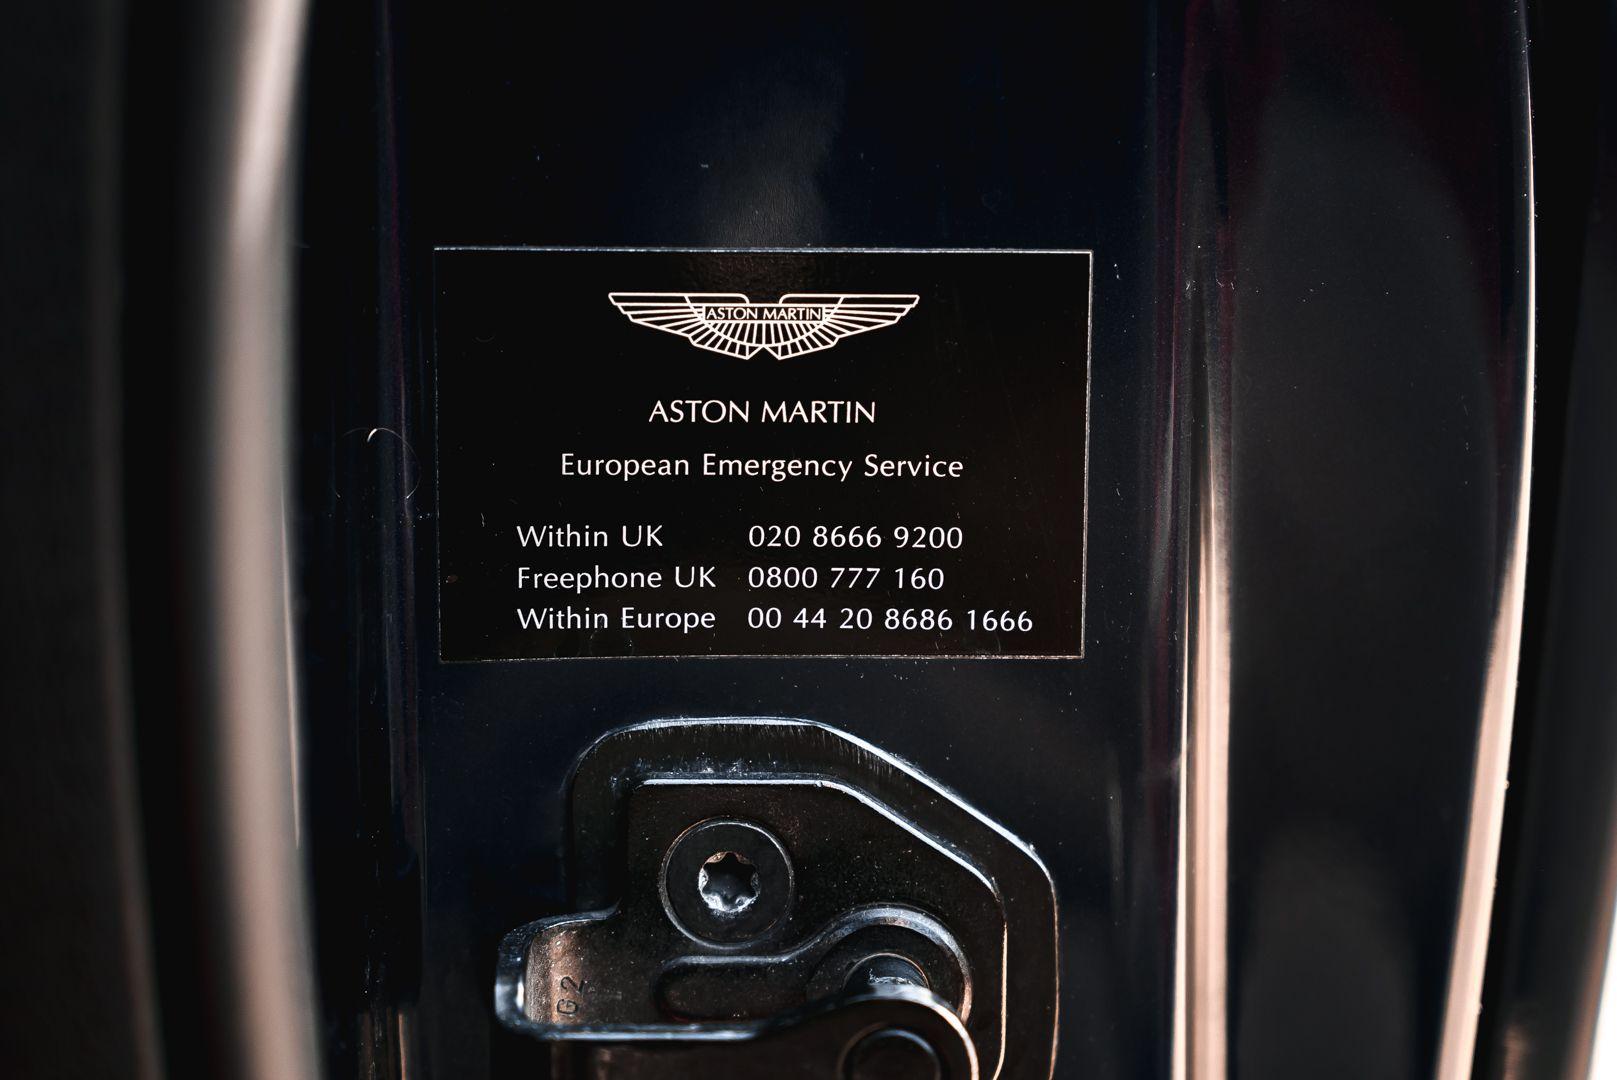 2001 Aston Martin V12 Vanquish 67953